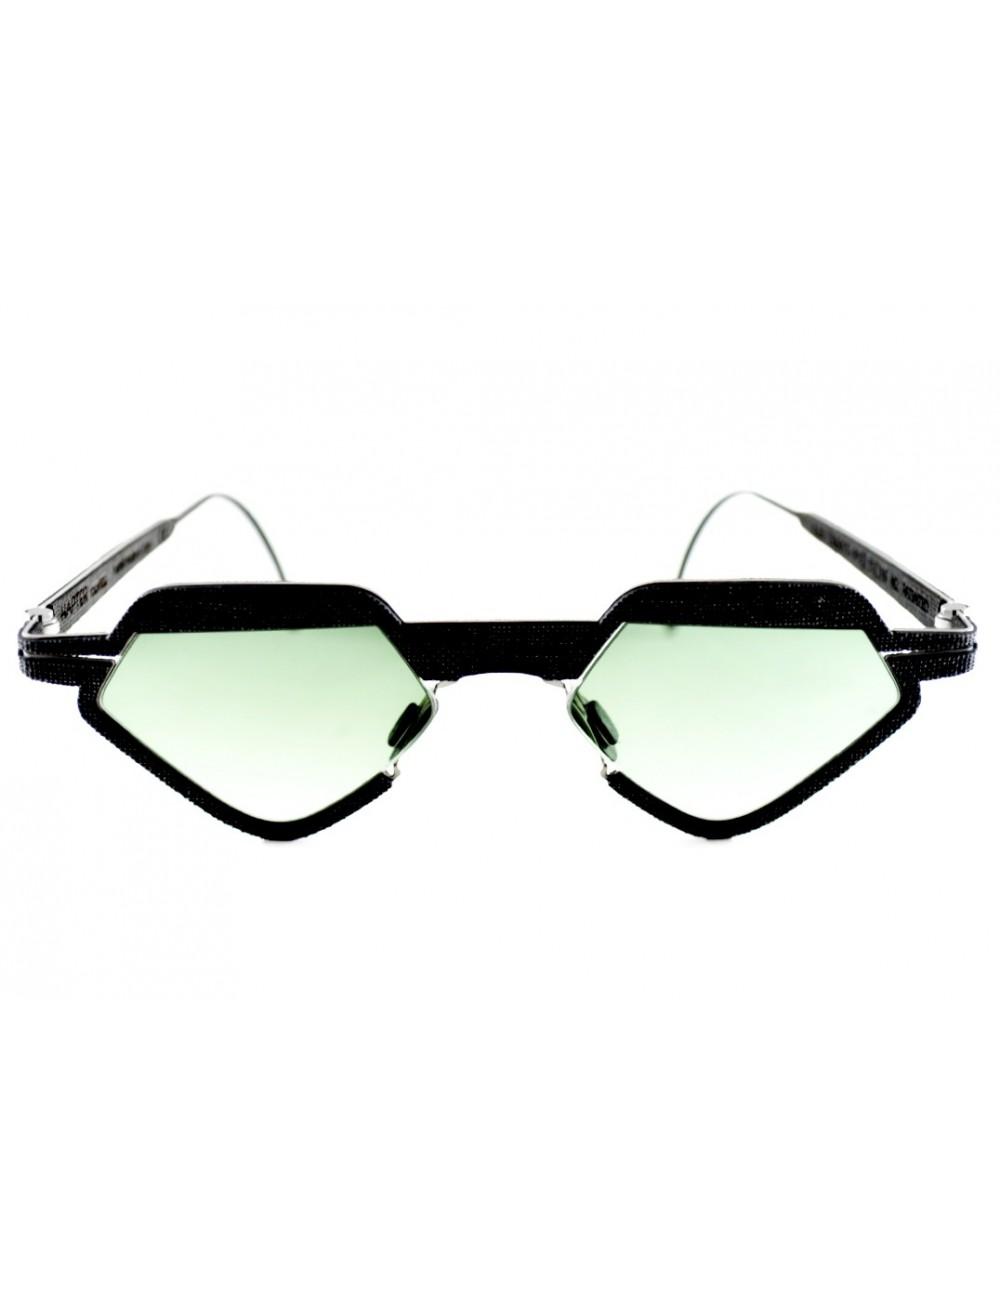 Hapter Hapter Il03 rb05  EyewearShop Online